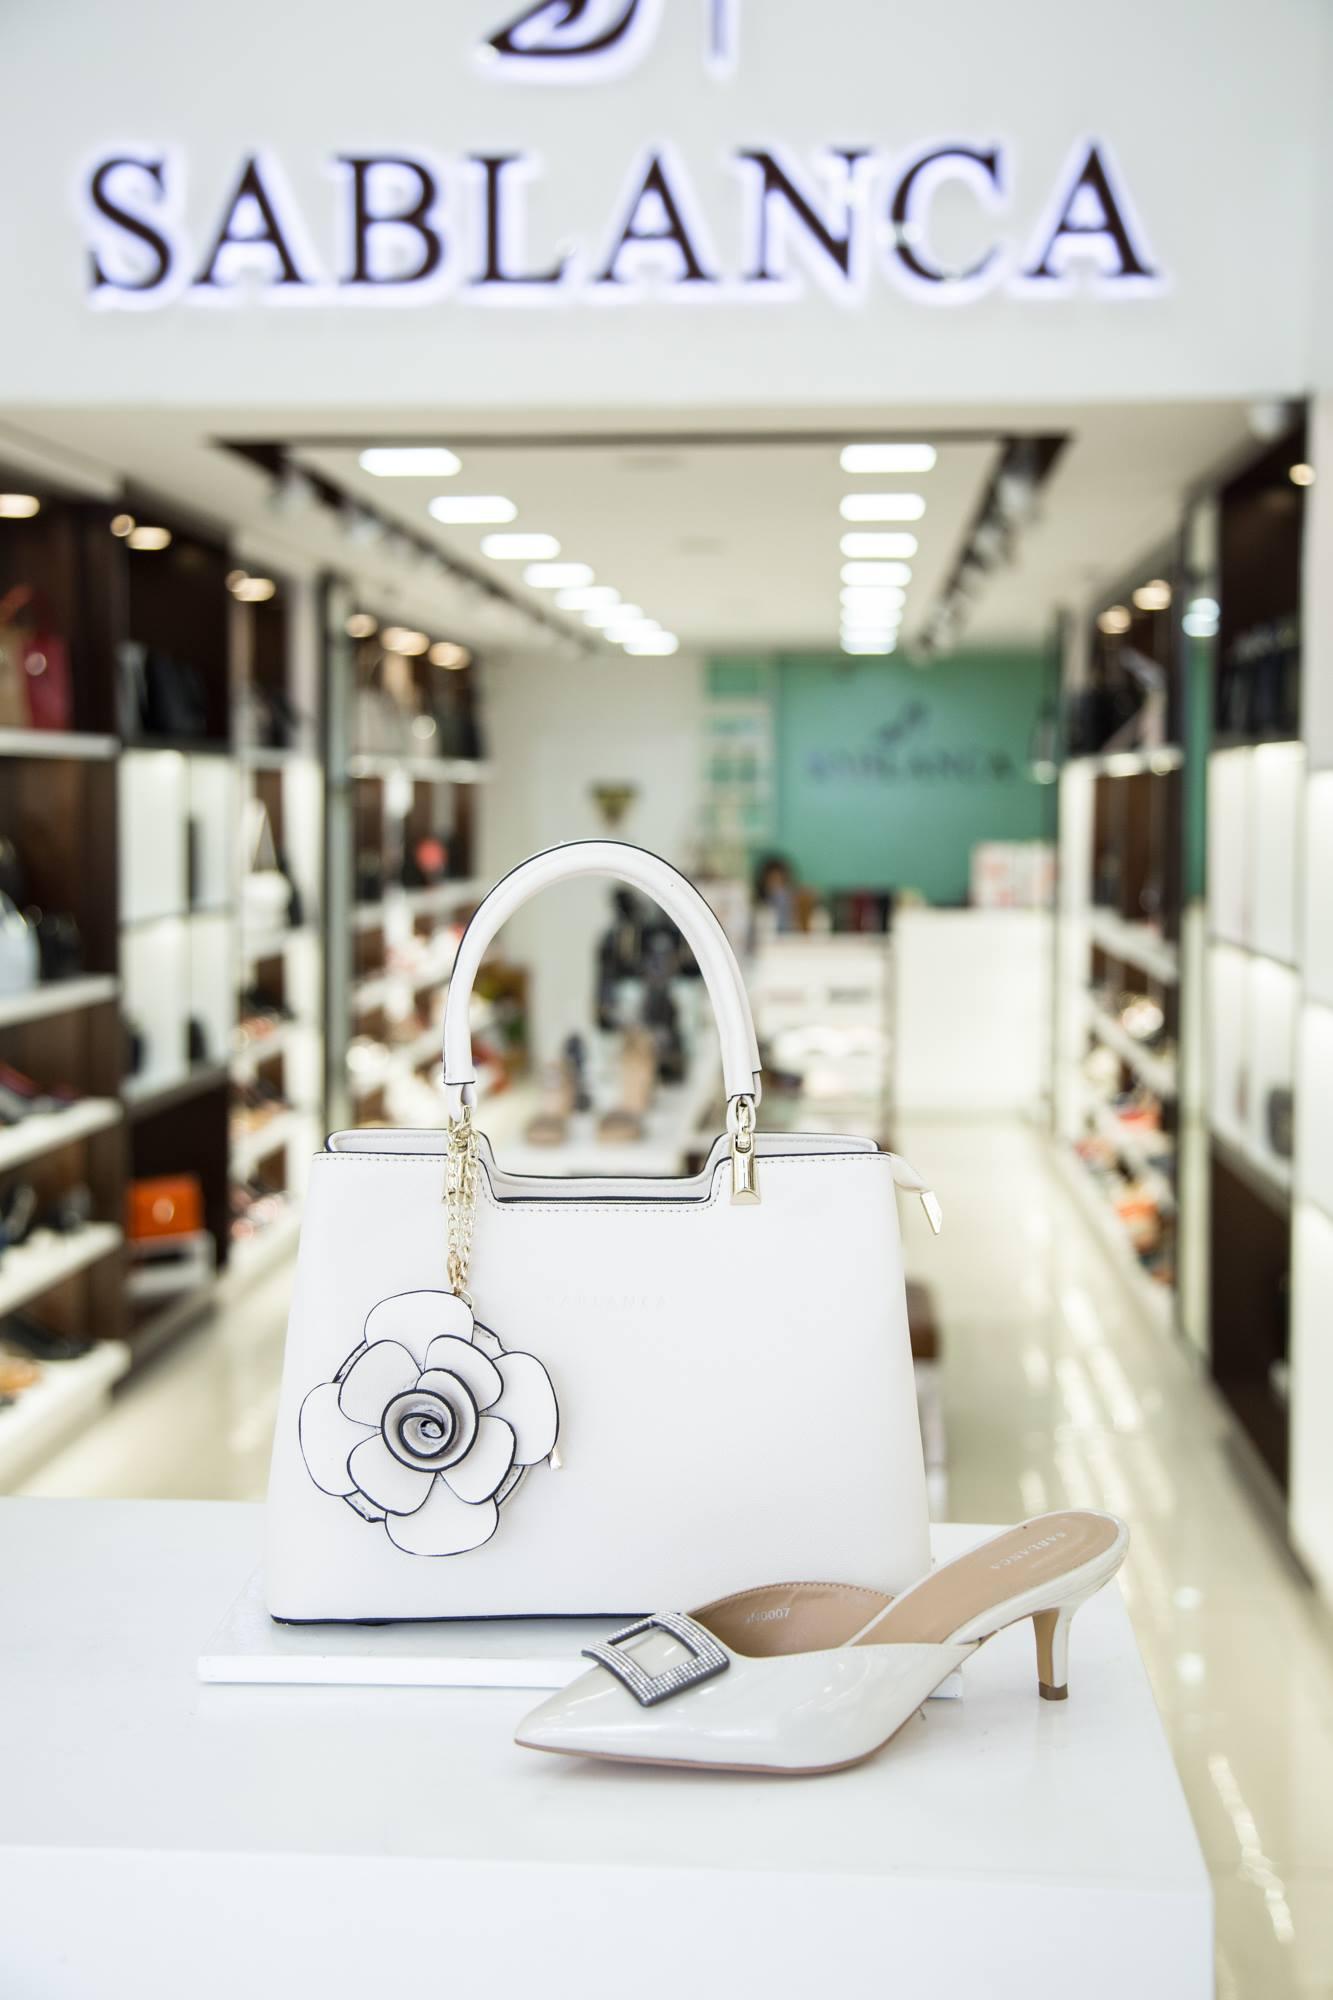 sablanca-happy-hour-sale-up-to-50%